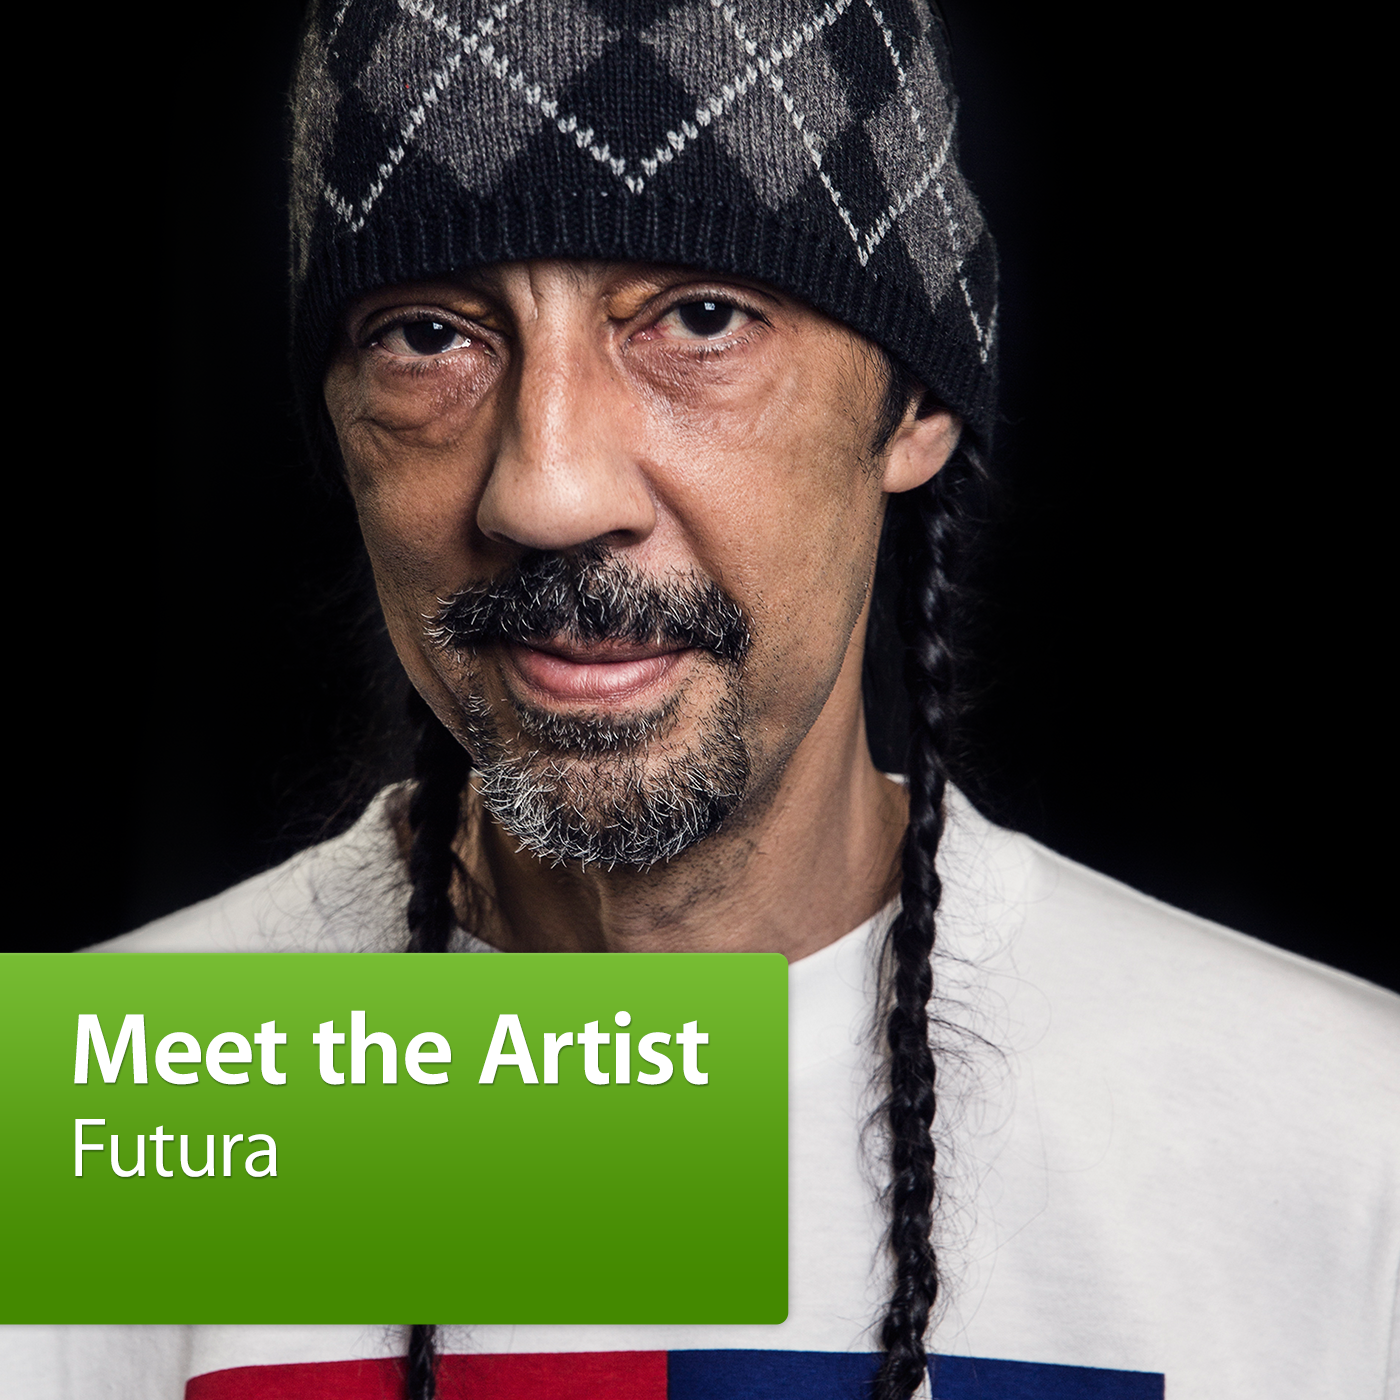 Futura: Meet the Artist